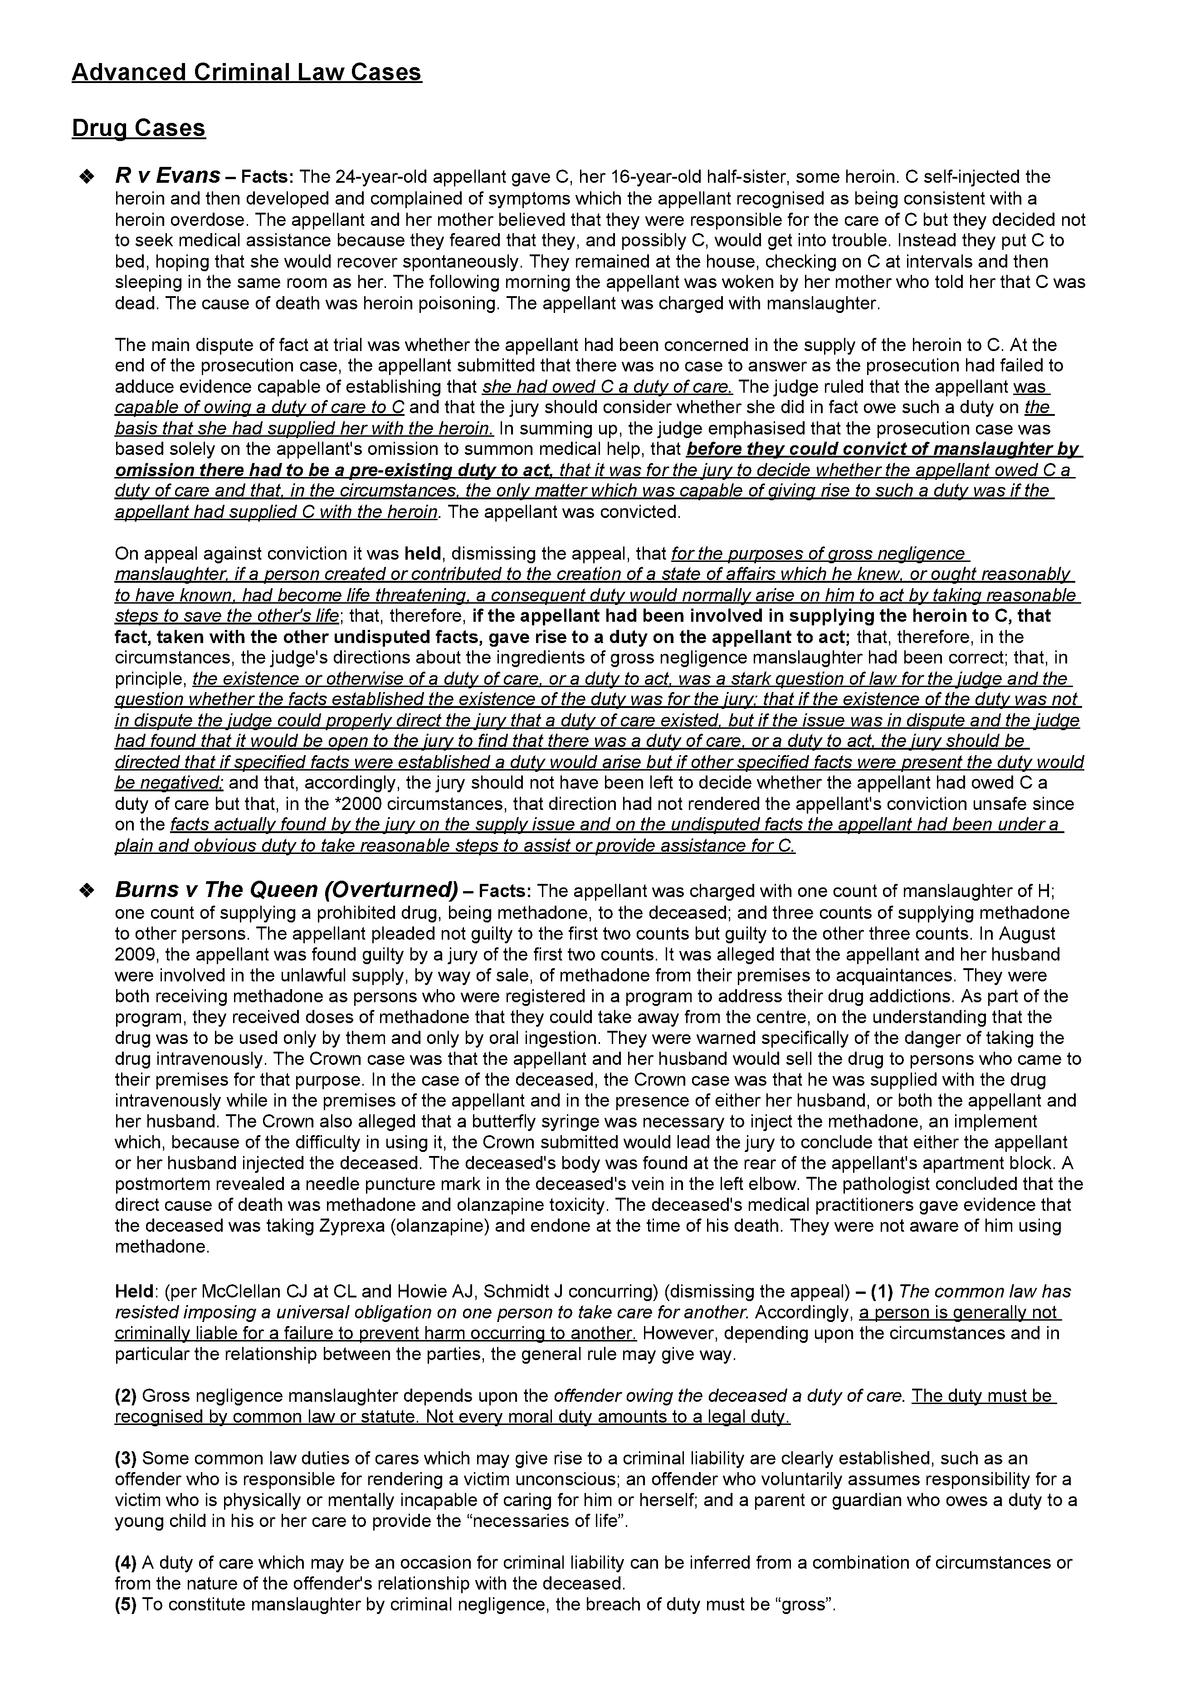 Advanced Crim Cases - LA4010:03: Advanced Criminal Law - StuDocu